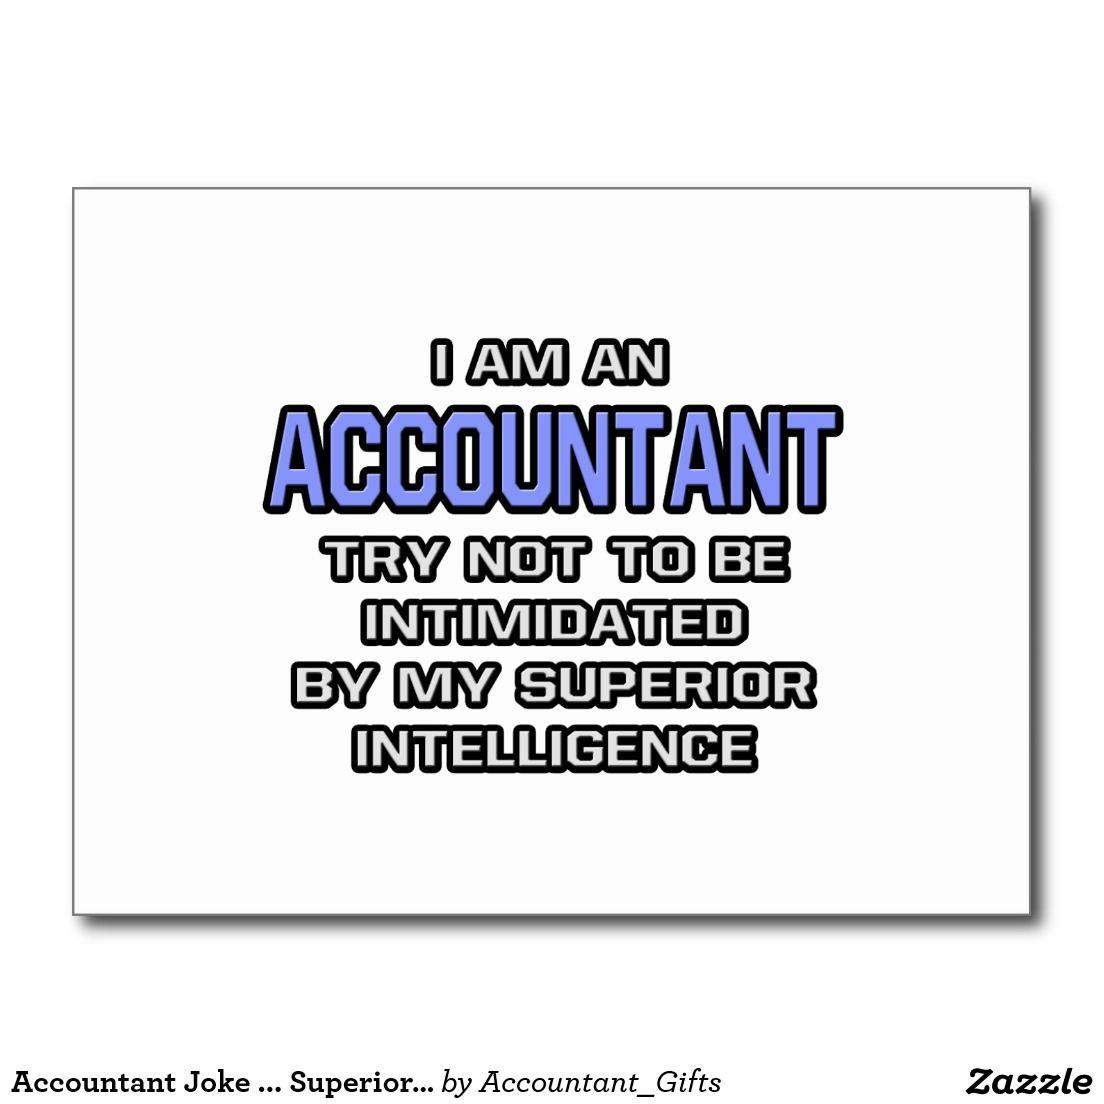 ac53653278f Accountant Joke ... Superior Intelligence Postcard